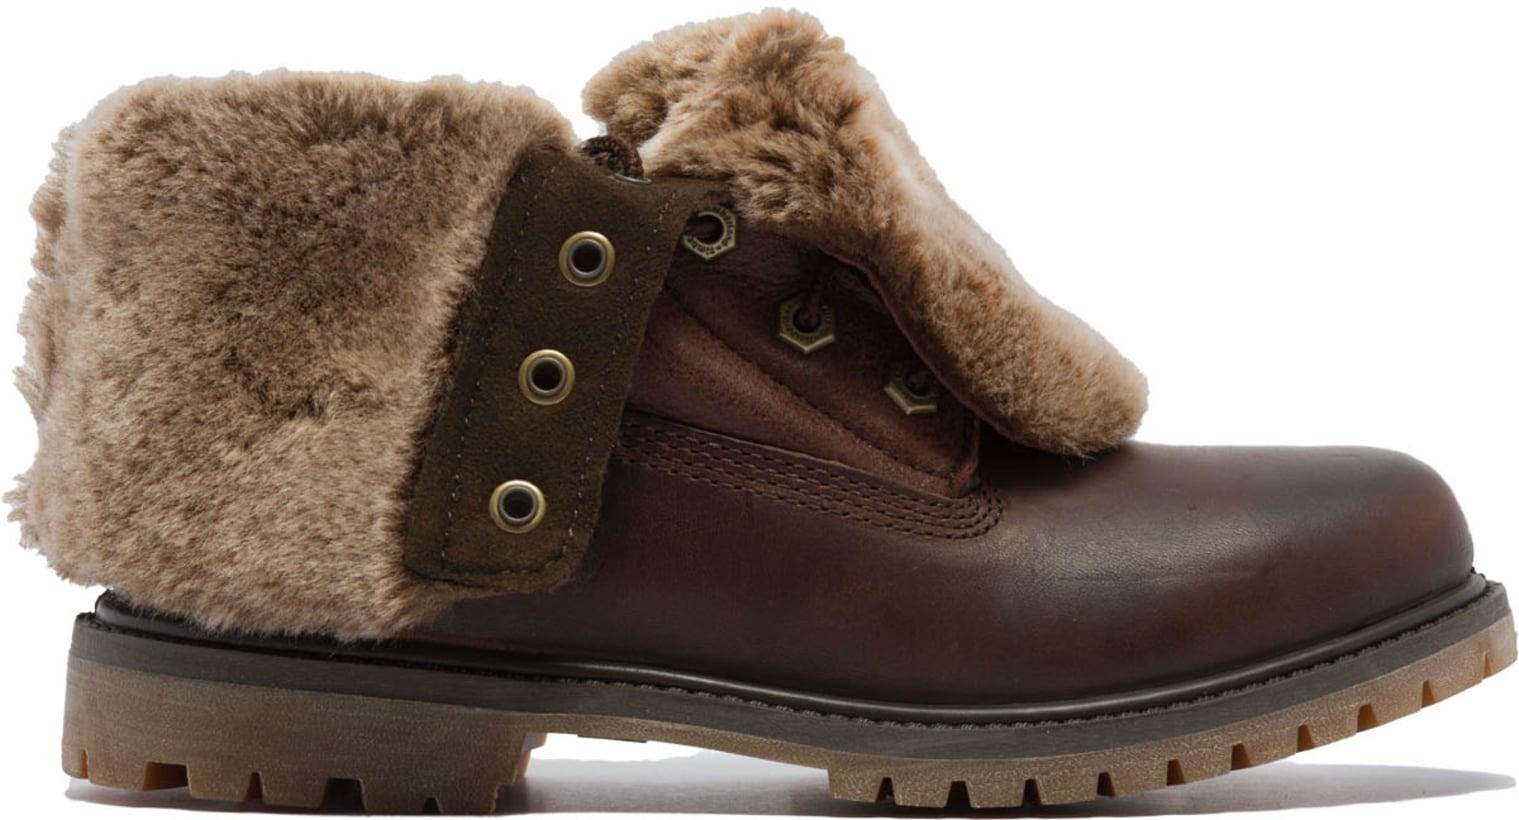 45d12bddb2d23 Timberland: Authentics Shearling Fold down Boots - Dark Brown ...